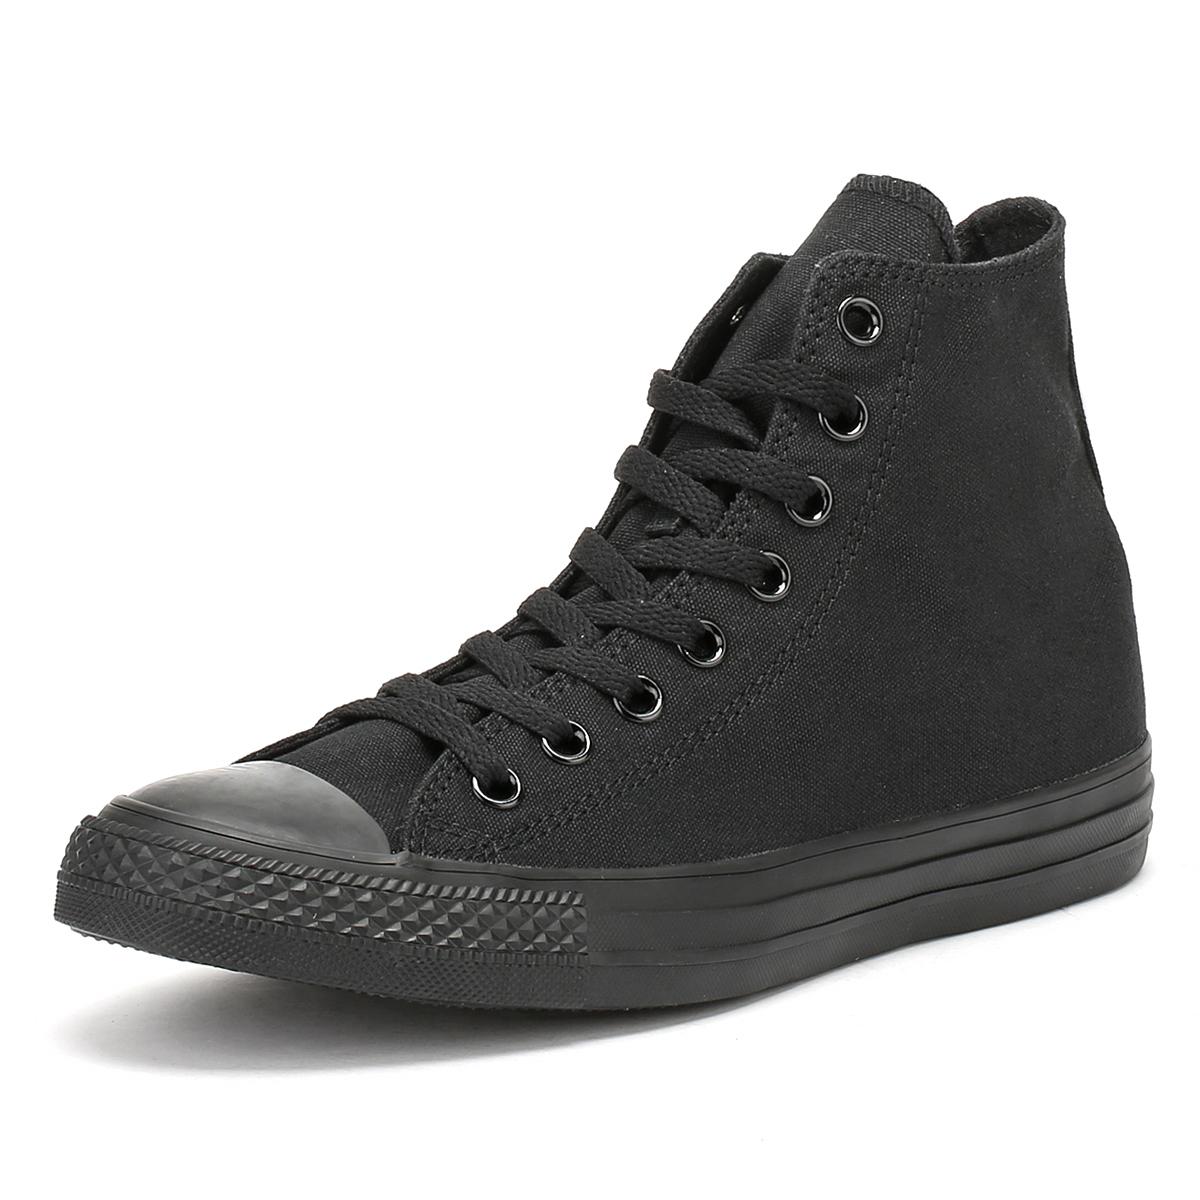 a966a6b55bb9 discount code for converse all star hi mono womens dfb56 f728d  ebay  converse black all star unisex trainers mens womens ece31 4641c